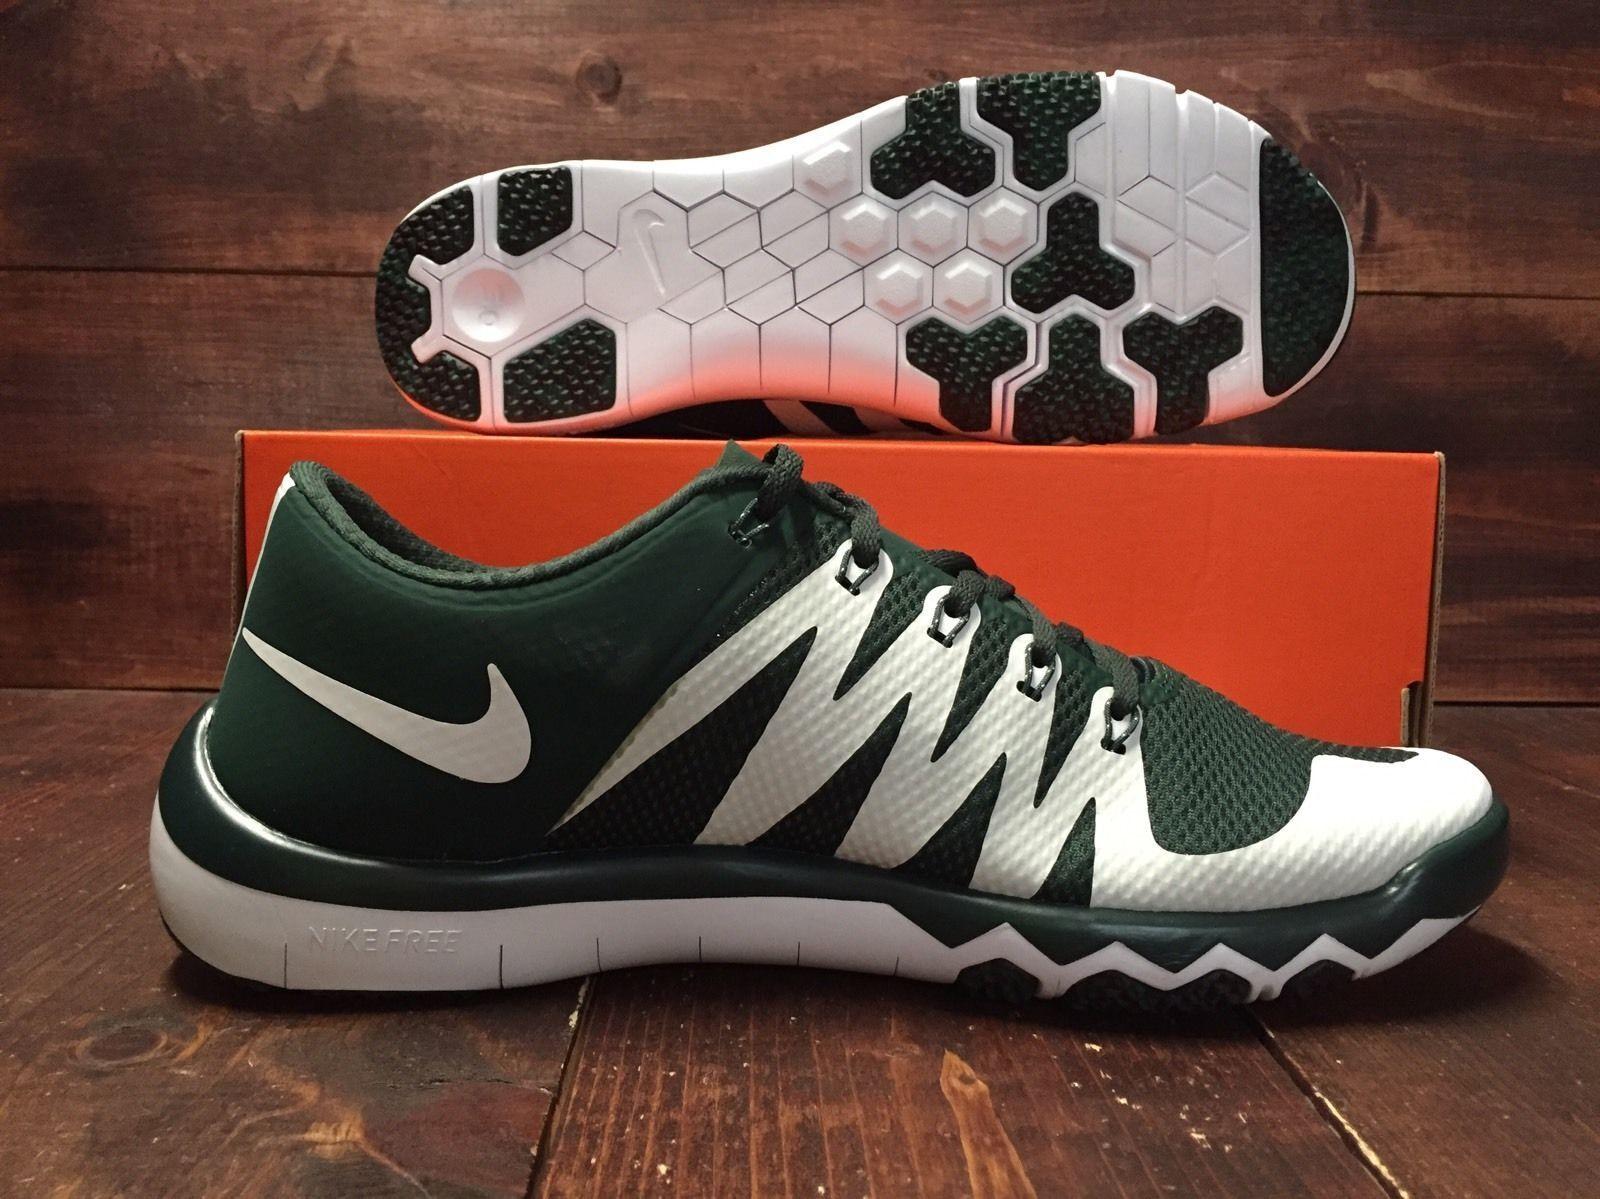 Nike Free Trainer 5.0 V6 AMP Michigan State Spartans MSU - Comfortable Casual wild